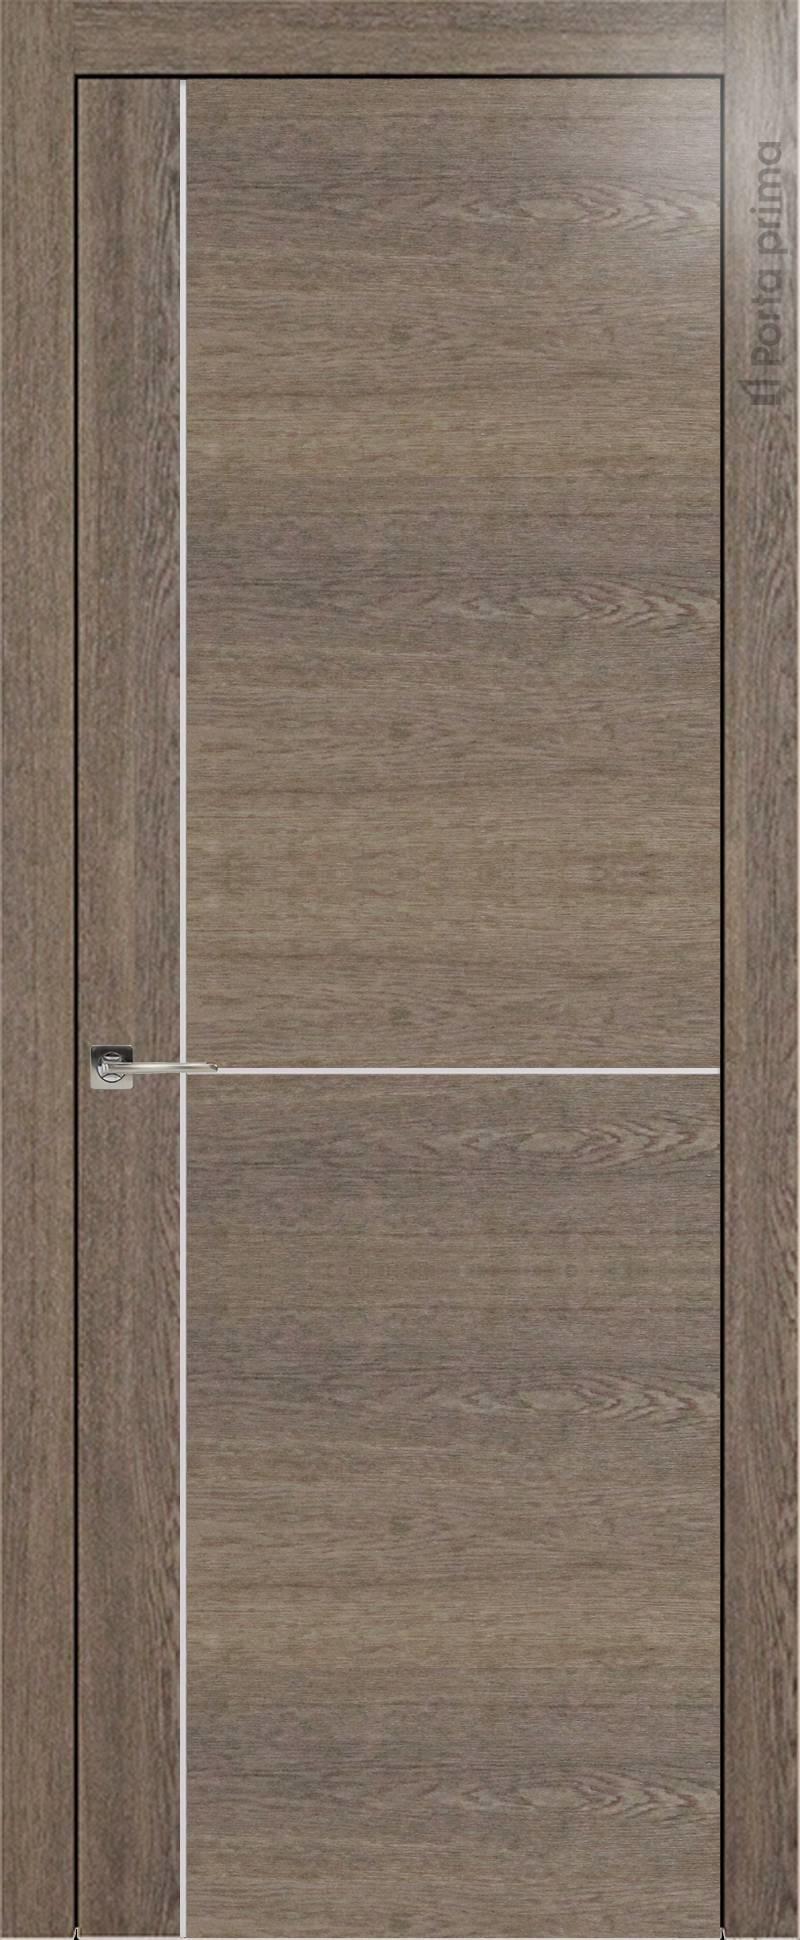 Tivoli Е-3 цвет - Дуб антик Без стекла (ДГ)